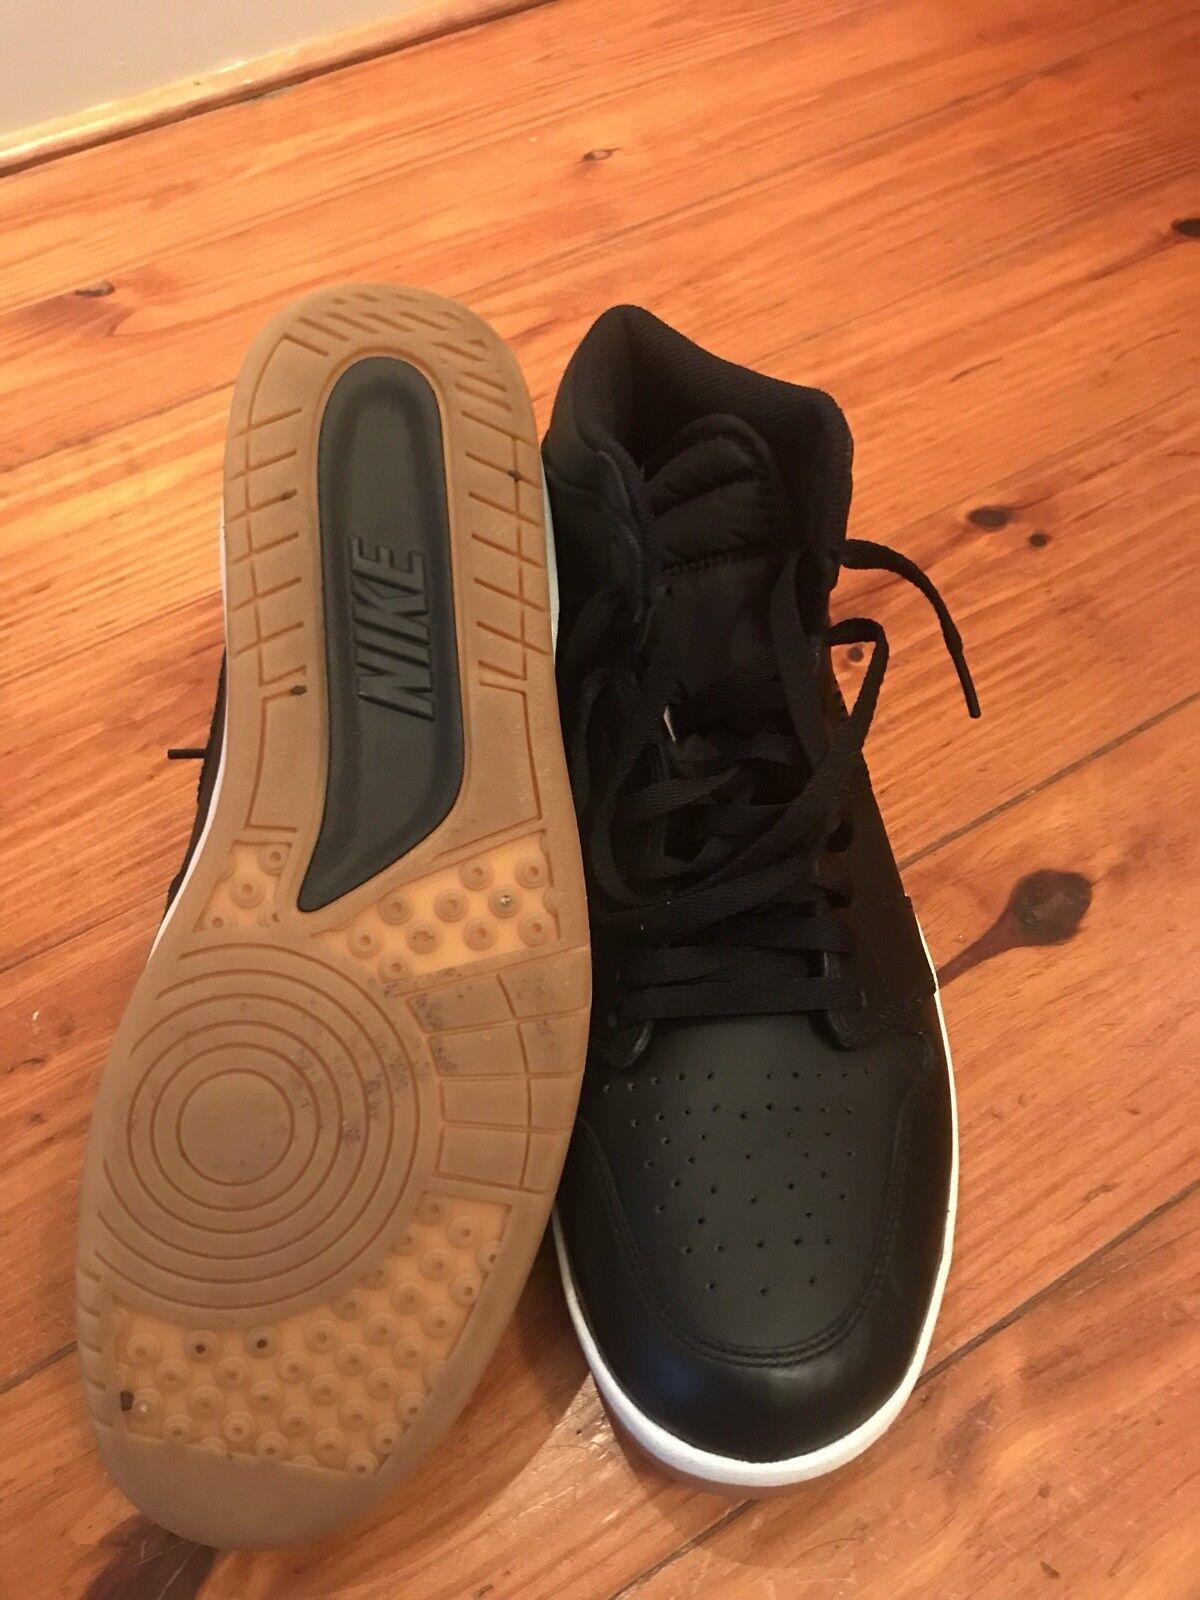 Nike Air Jordan High The Return 1.5 Black Gum Retro The latest discount shoes for men and women